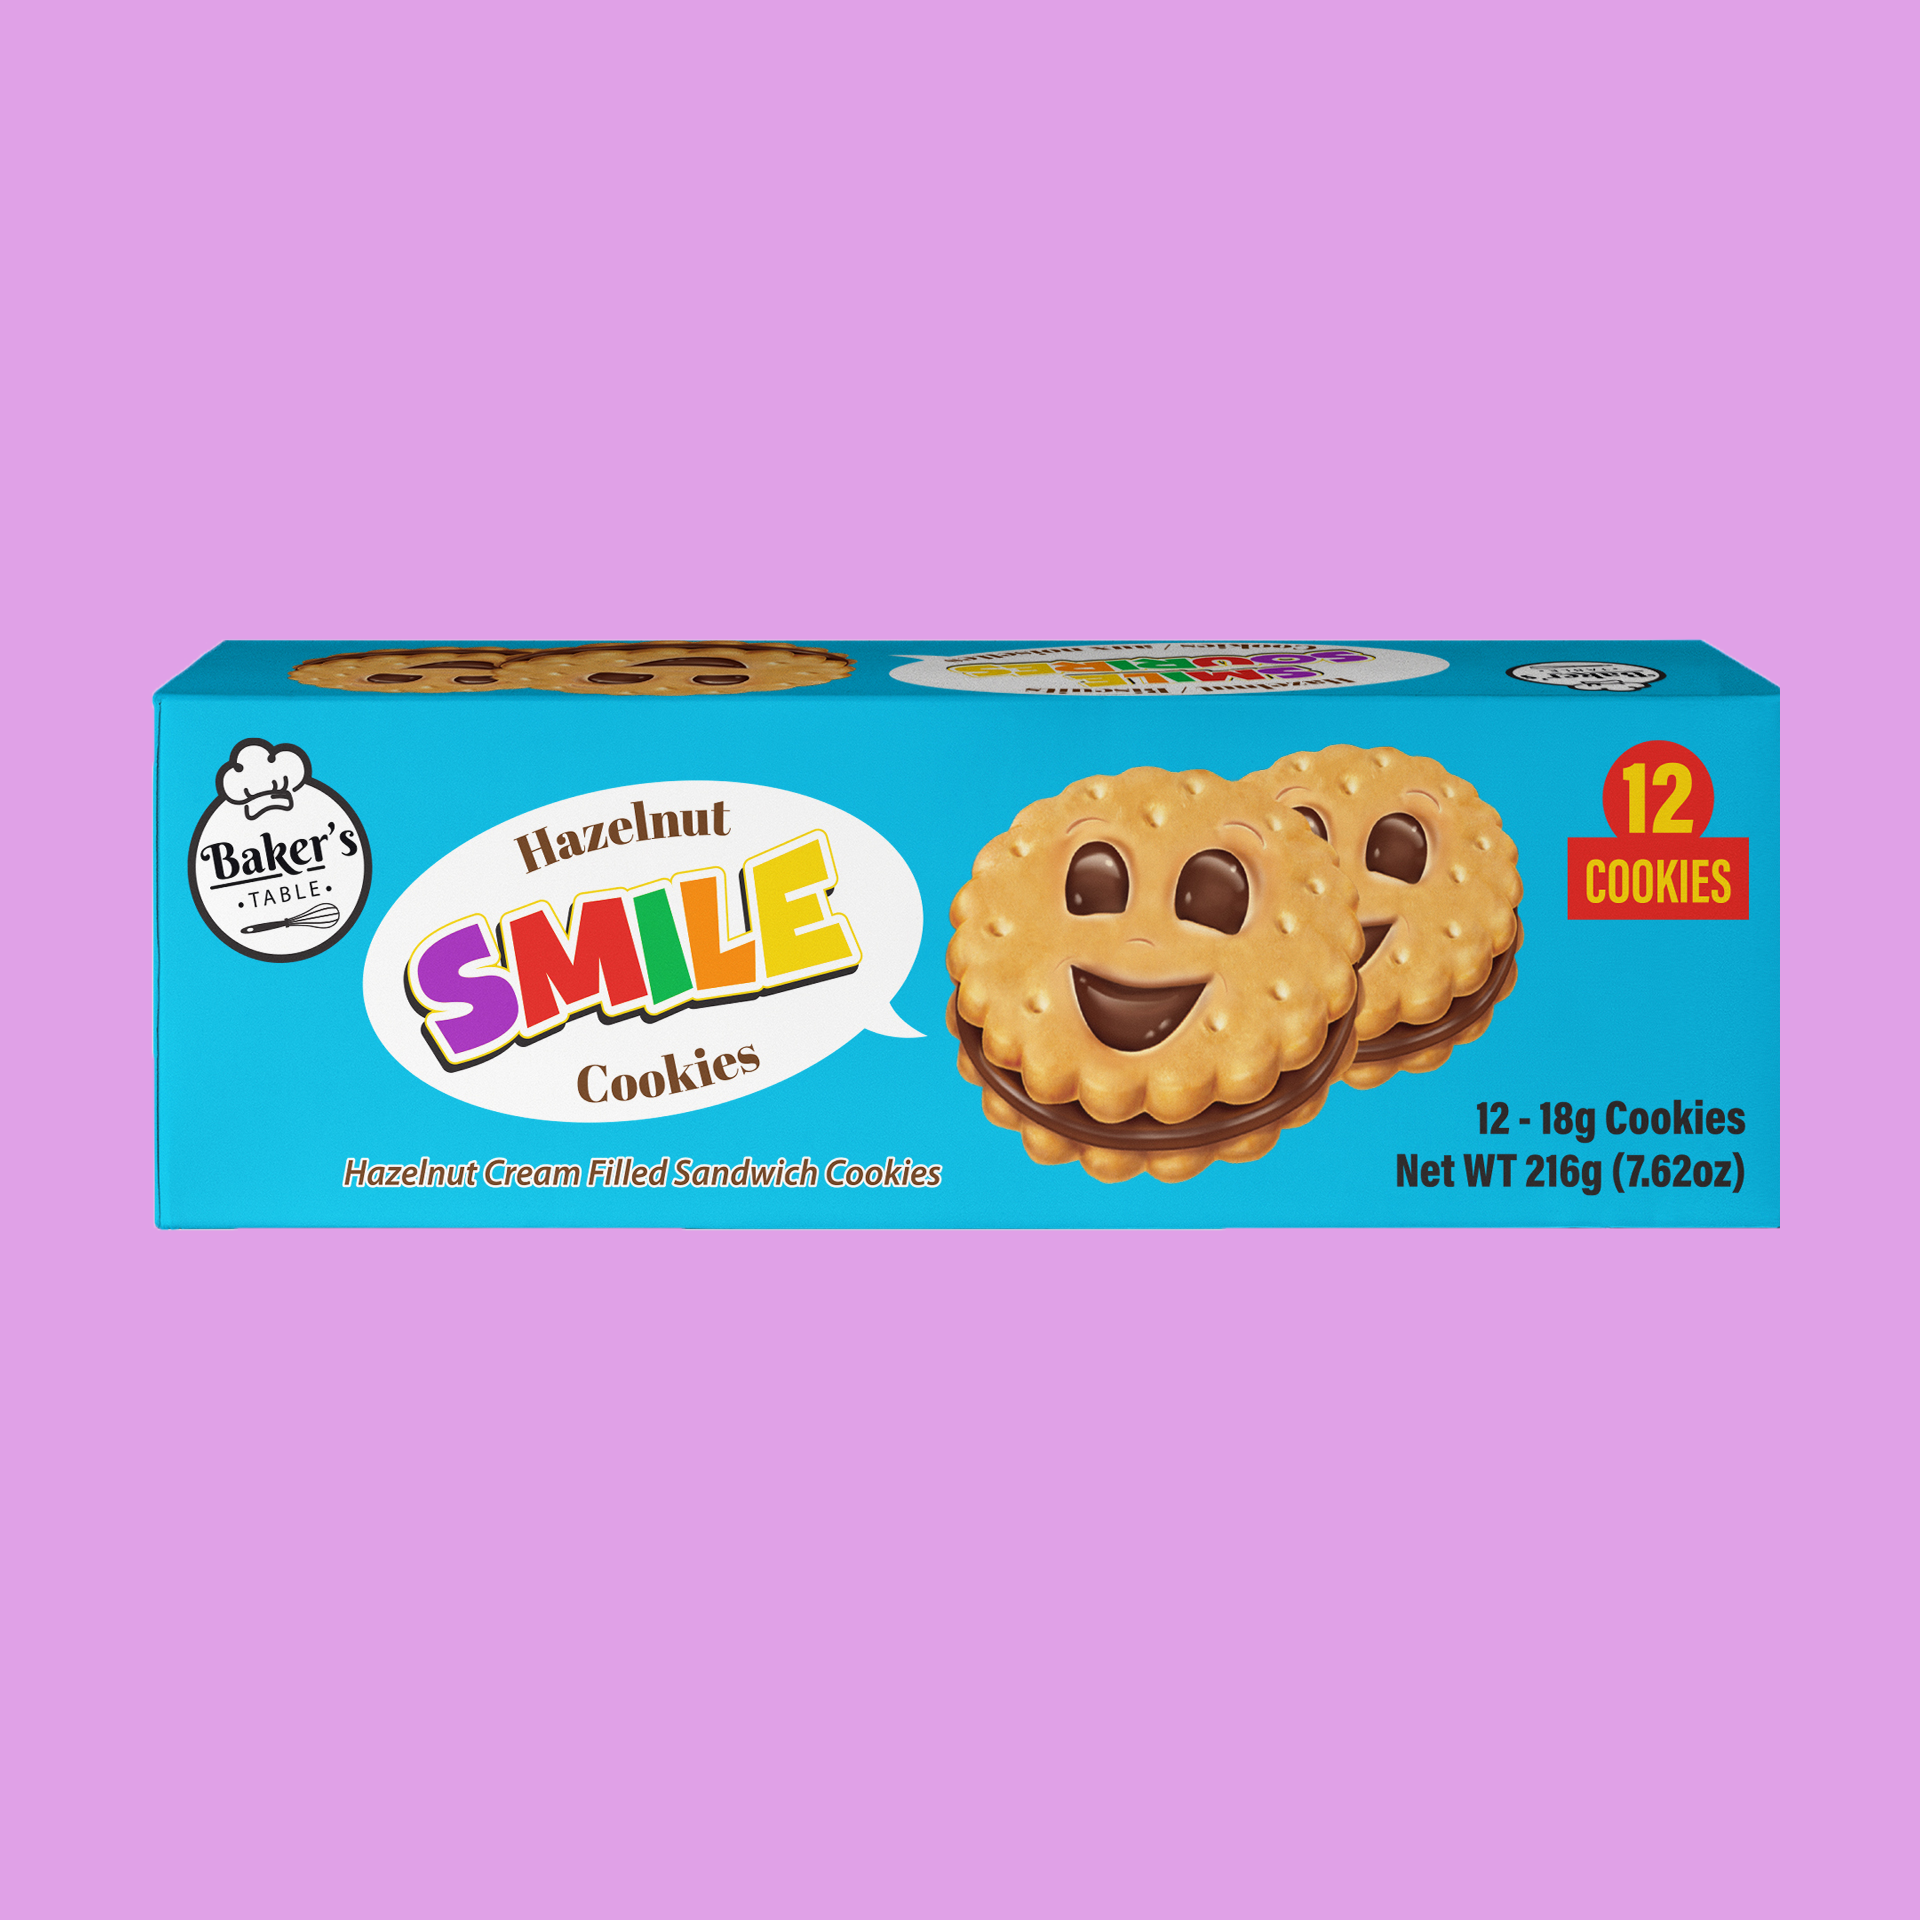 https://exclusivebrands.ca/wp-content/uploads/2021/04/silo-Bakers_Table_Hazelnut-SMILES_Cookies.png